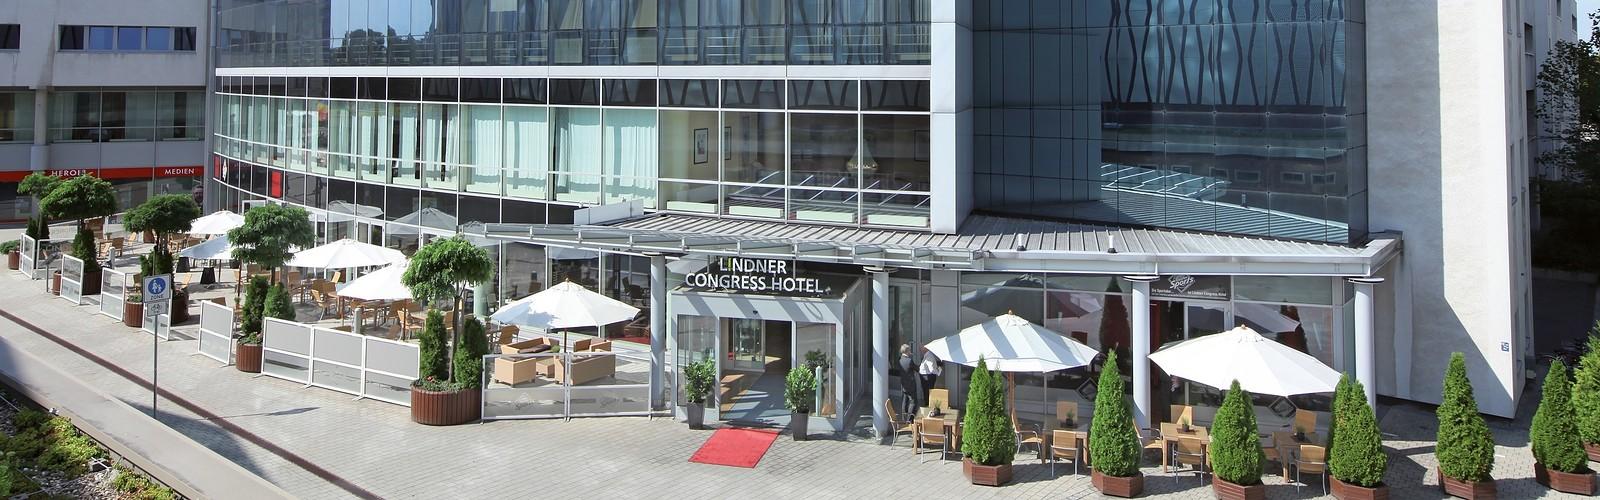 Hoteleingang, Foto: Lindner Congress Cottbus